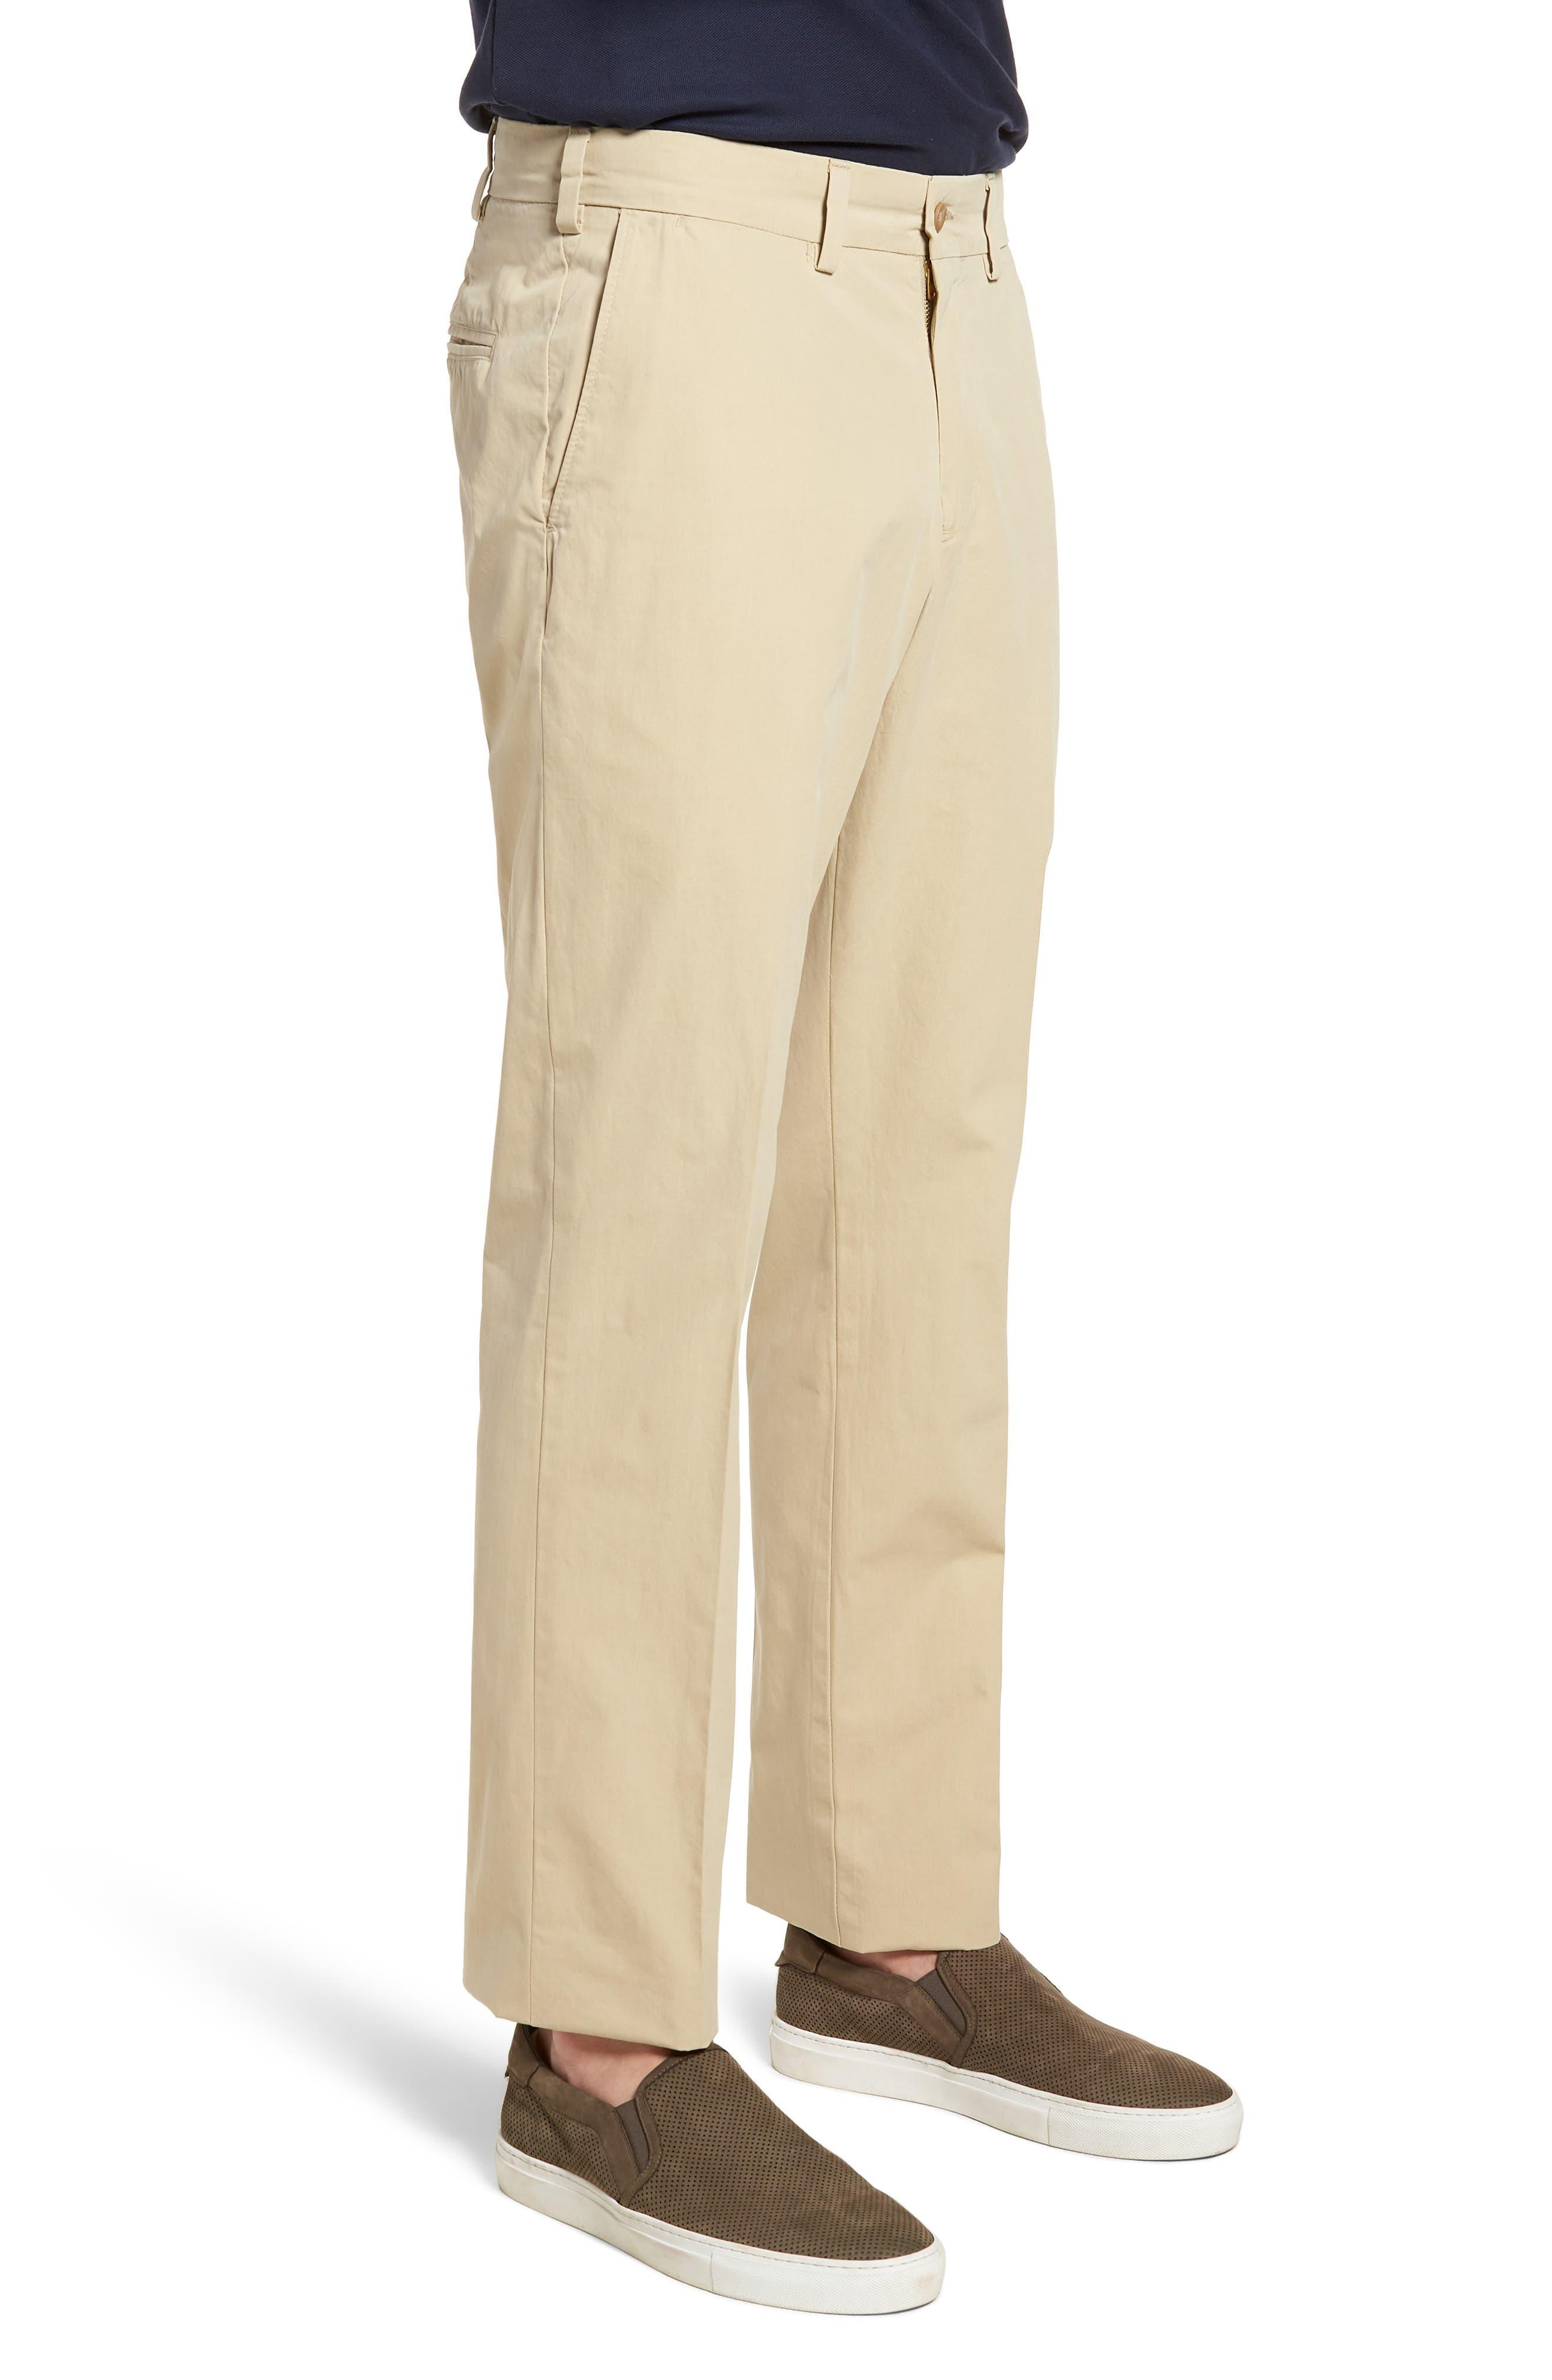 M3 Straight Fit Flat Front Tropical Poplin Pants,                             Alternate thumbnail 3, color,                             Khaki